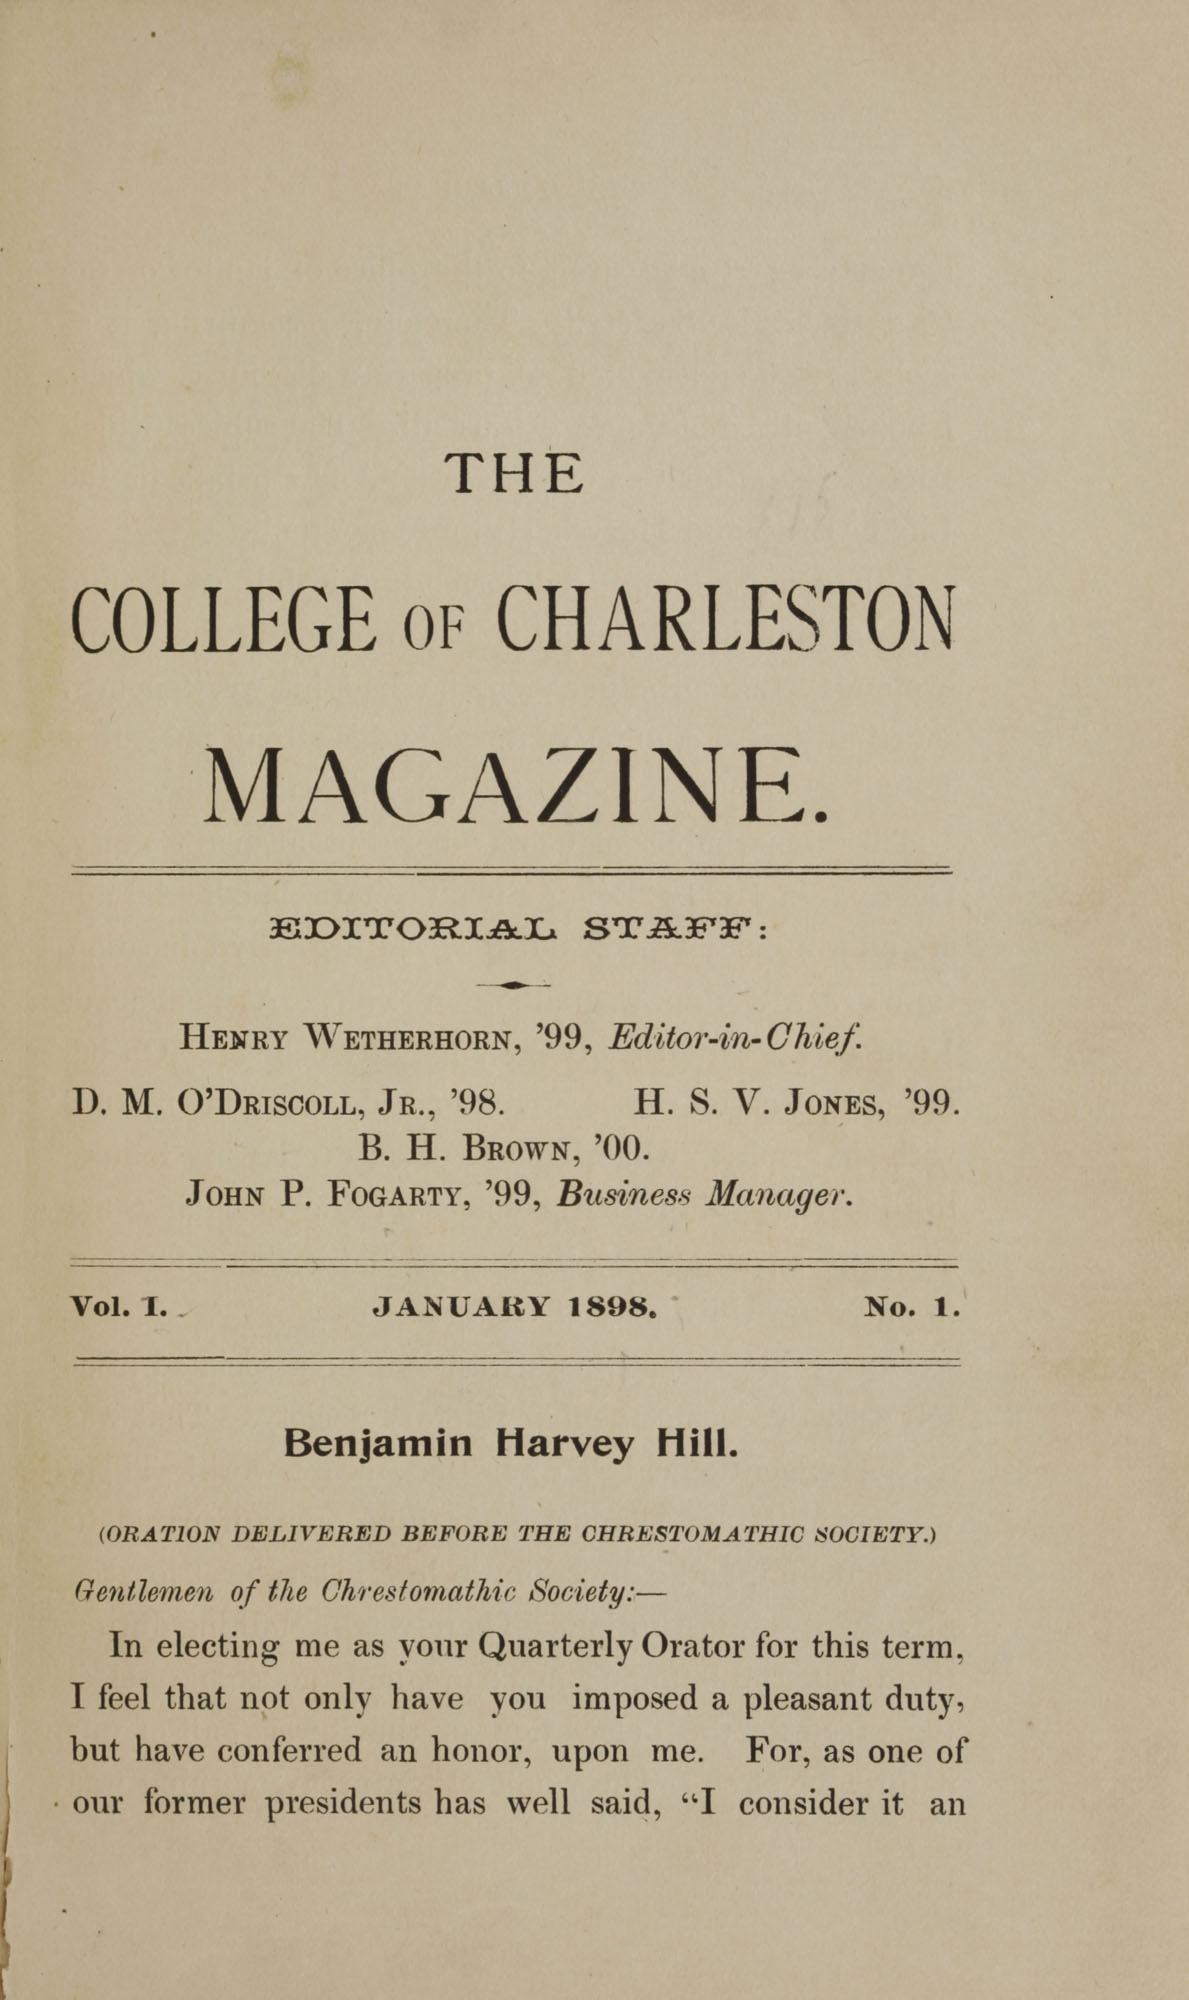 College of Charleston Magazine, 1898, Vol I. No. 1, page 3